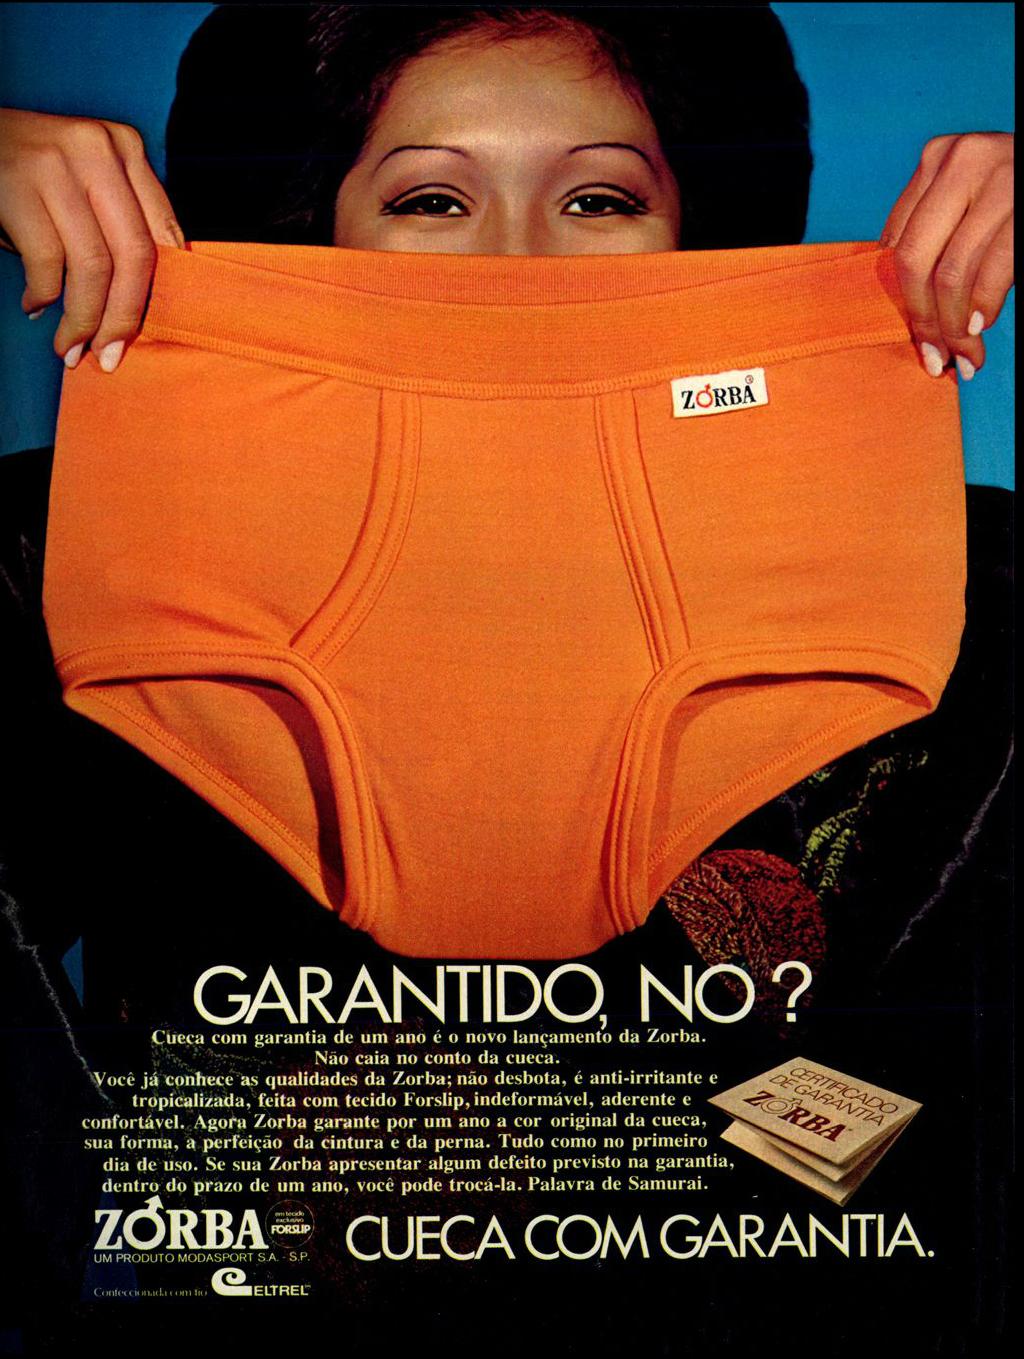 Propaganda de 1973 das Cuecas Zorba atestando a qualidade do seu produto